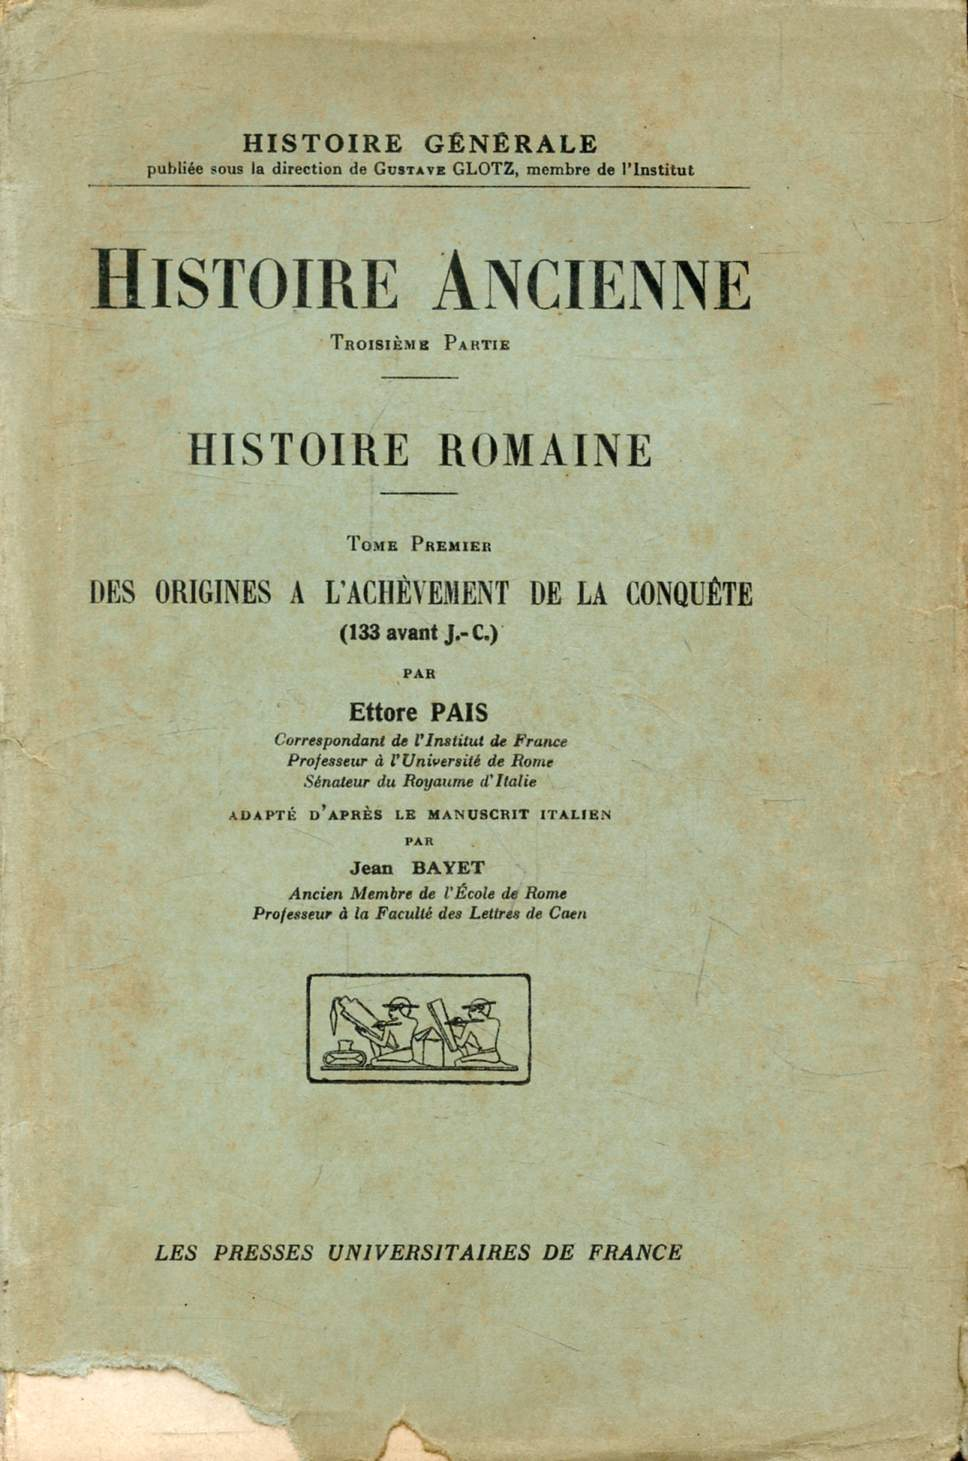 HISTOIRE ANCIENNE, 3e PARTIE, HISTOIRE ROMAINE, TOME I, DES ORIGINES A L'ACHEVEMENT DE LA CONQUETE (133 av. J.-C.)